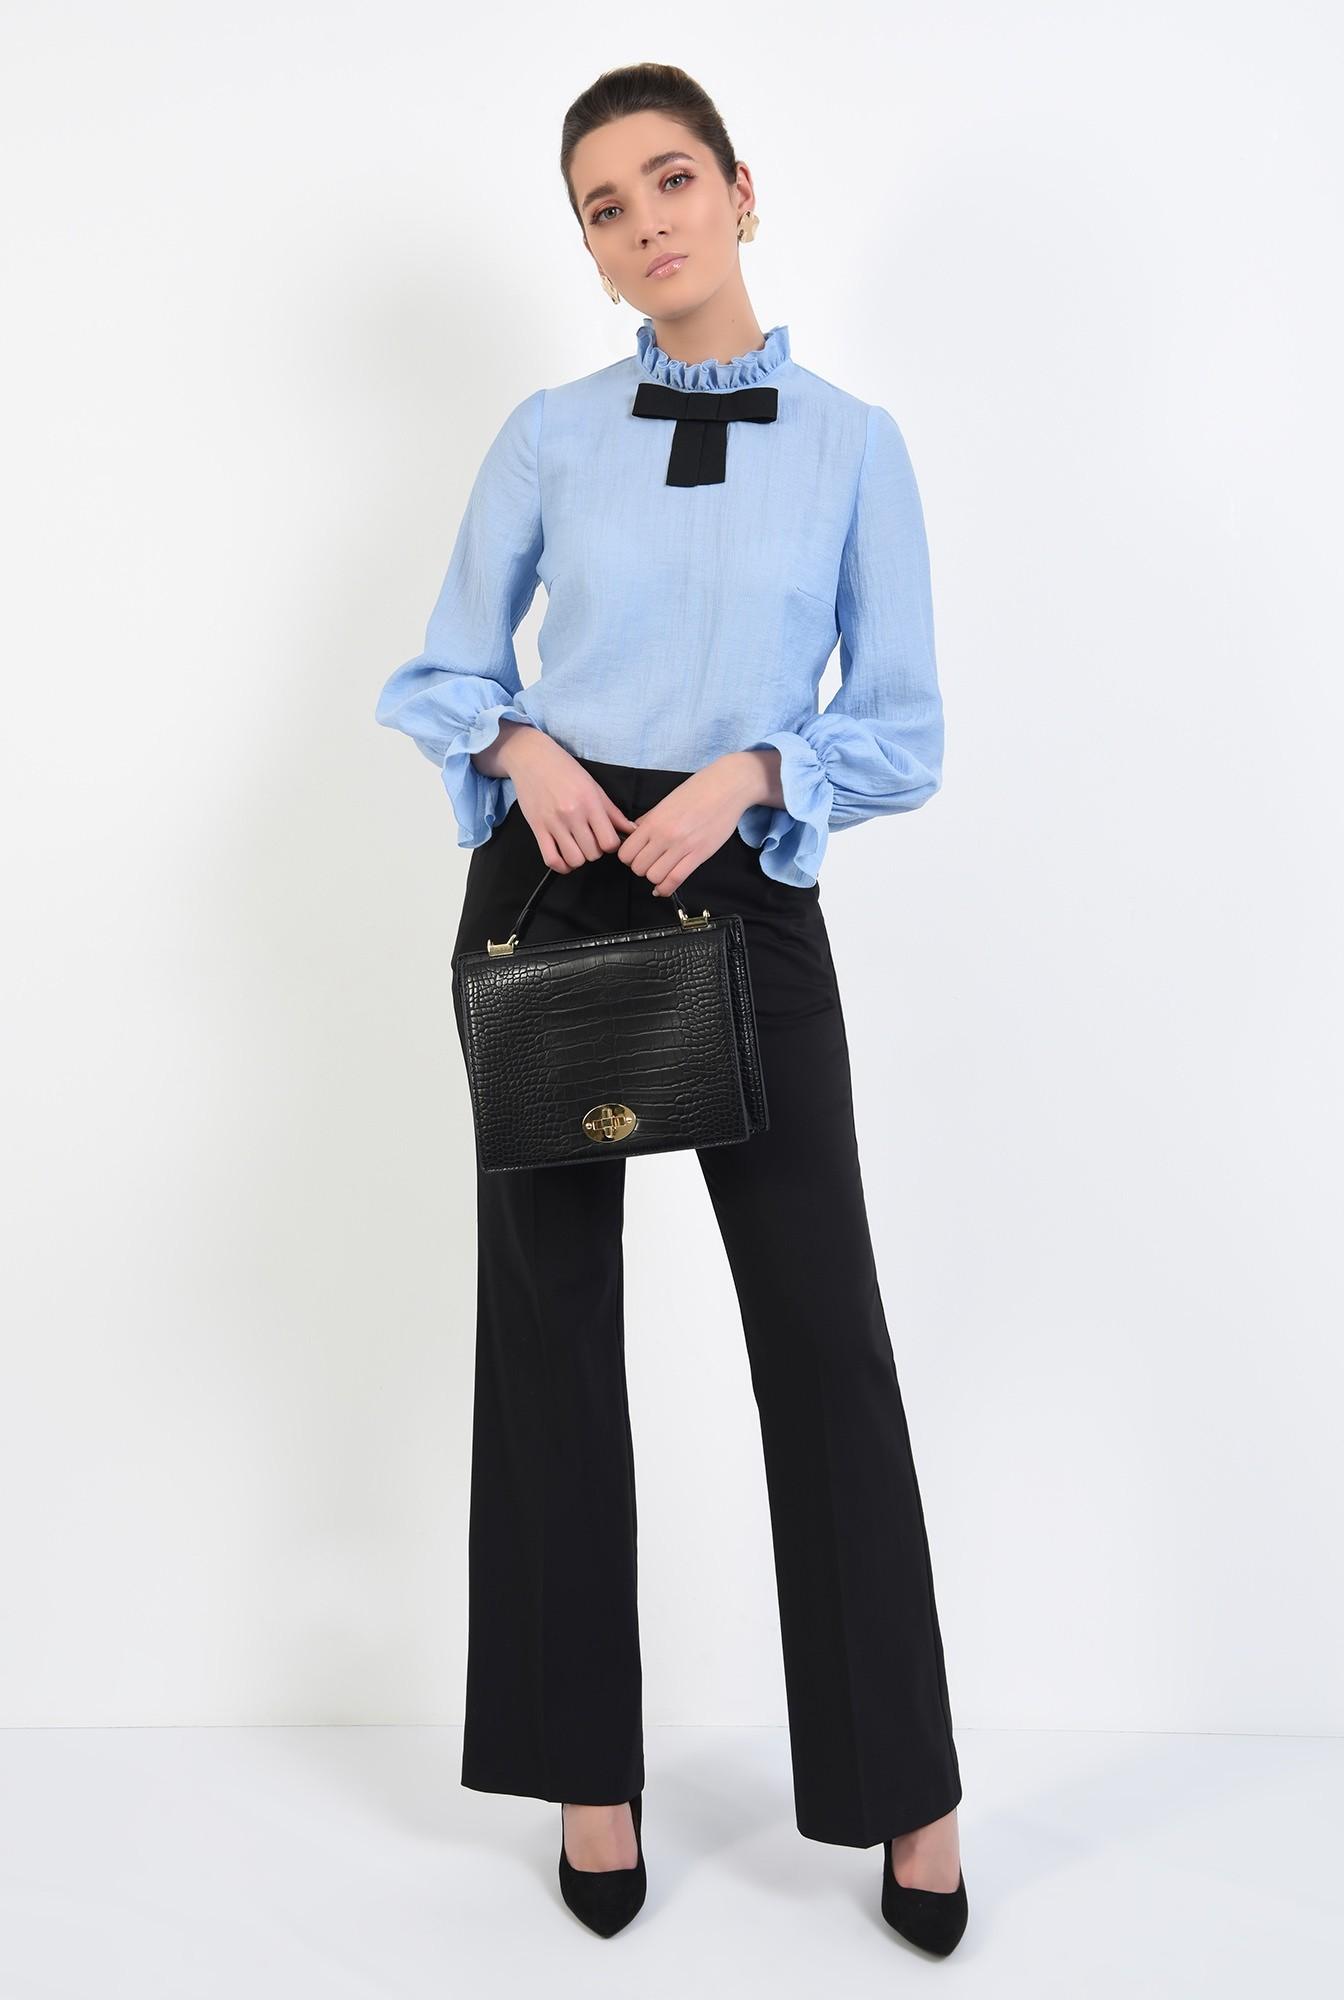 3 - bluza office, bleu, cu funda, mansete volan, guler incretit